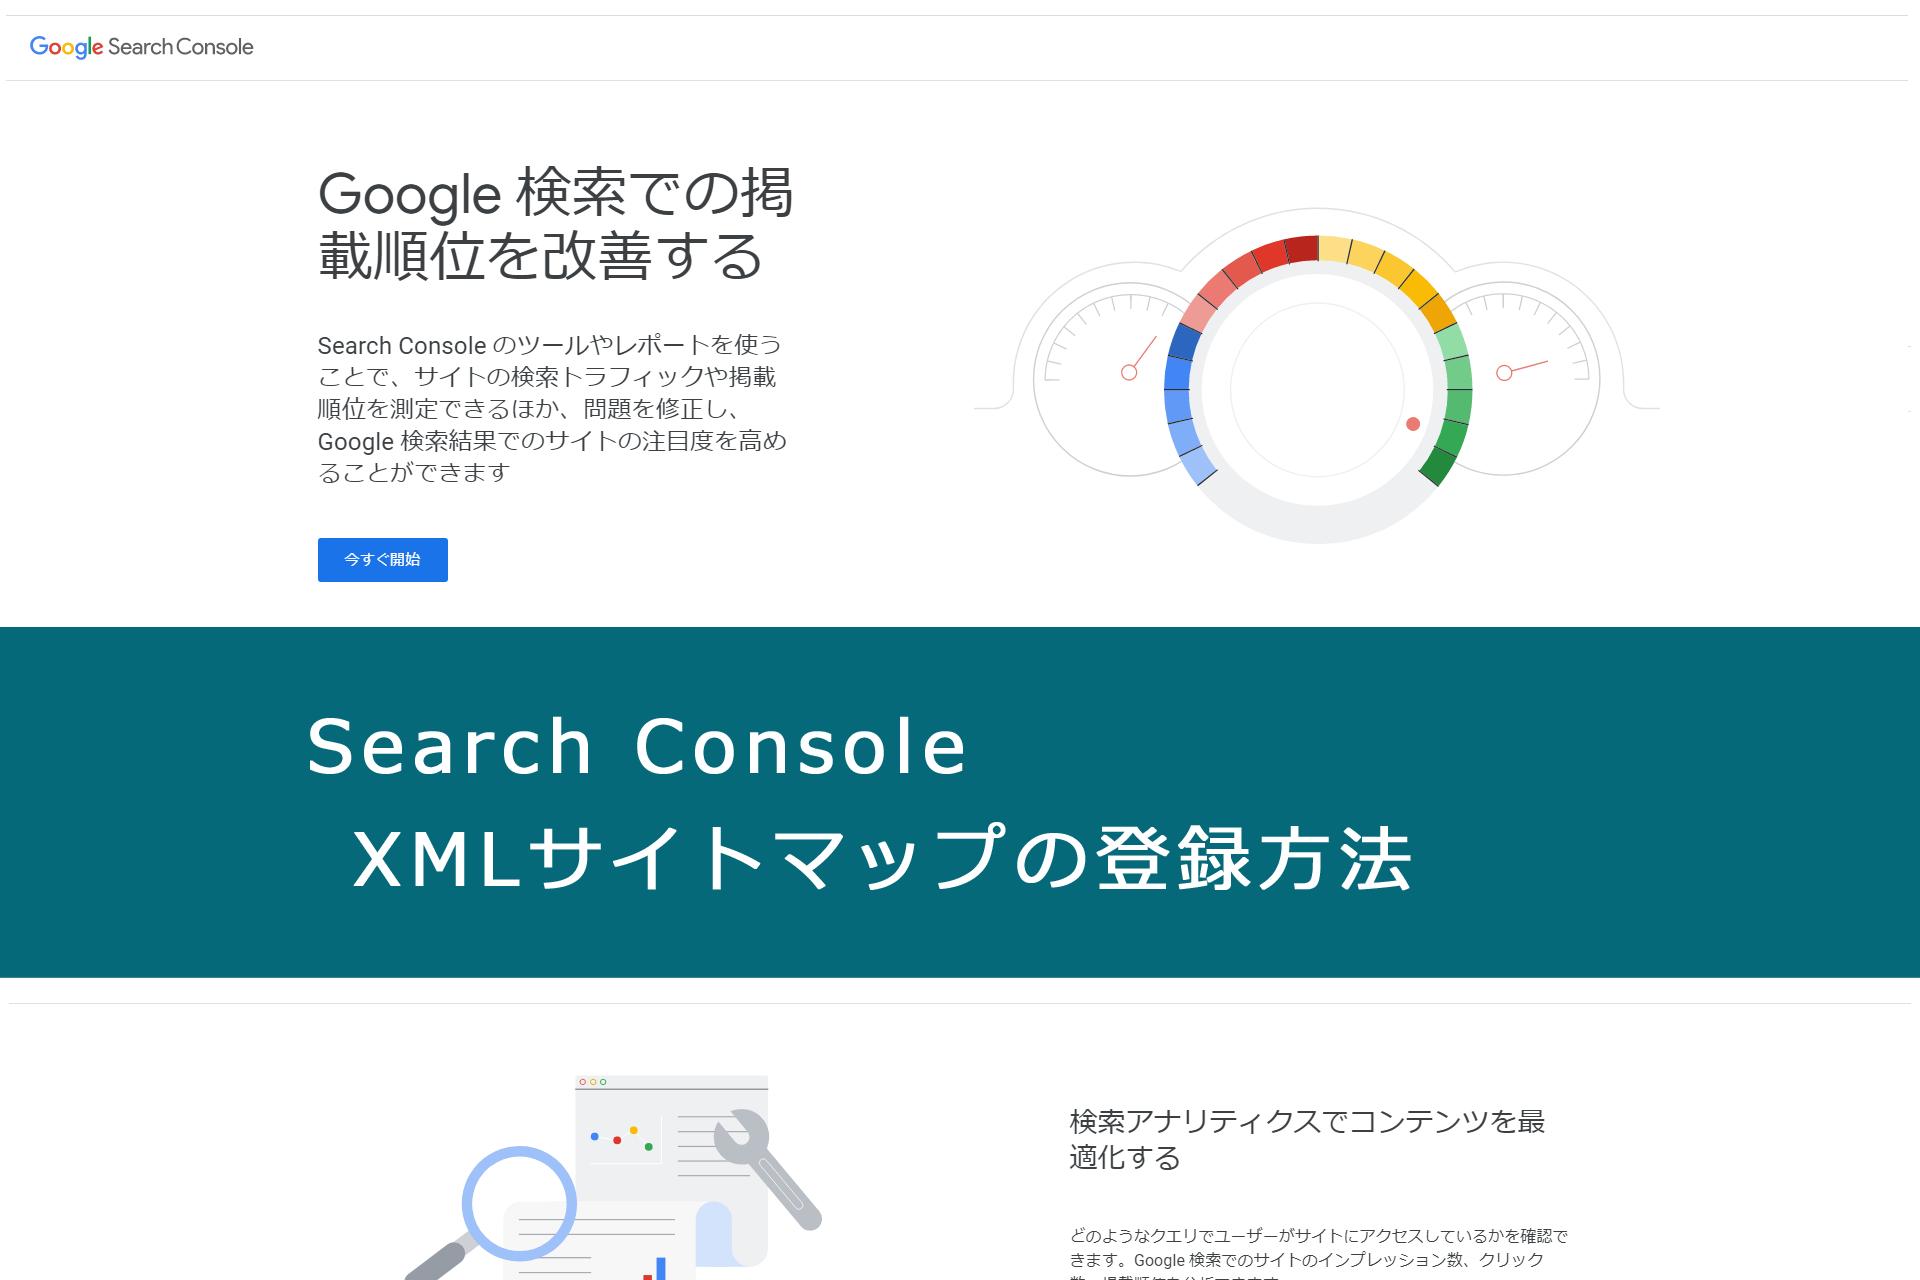 Search Console(サーチコンソール)XMLサイトマップの登録方法